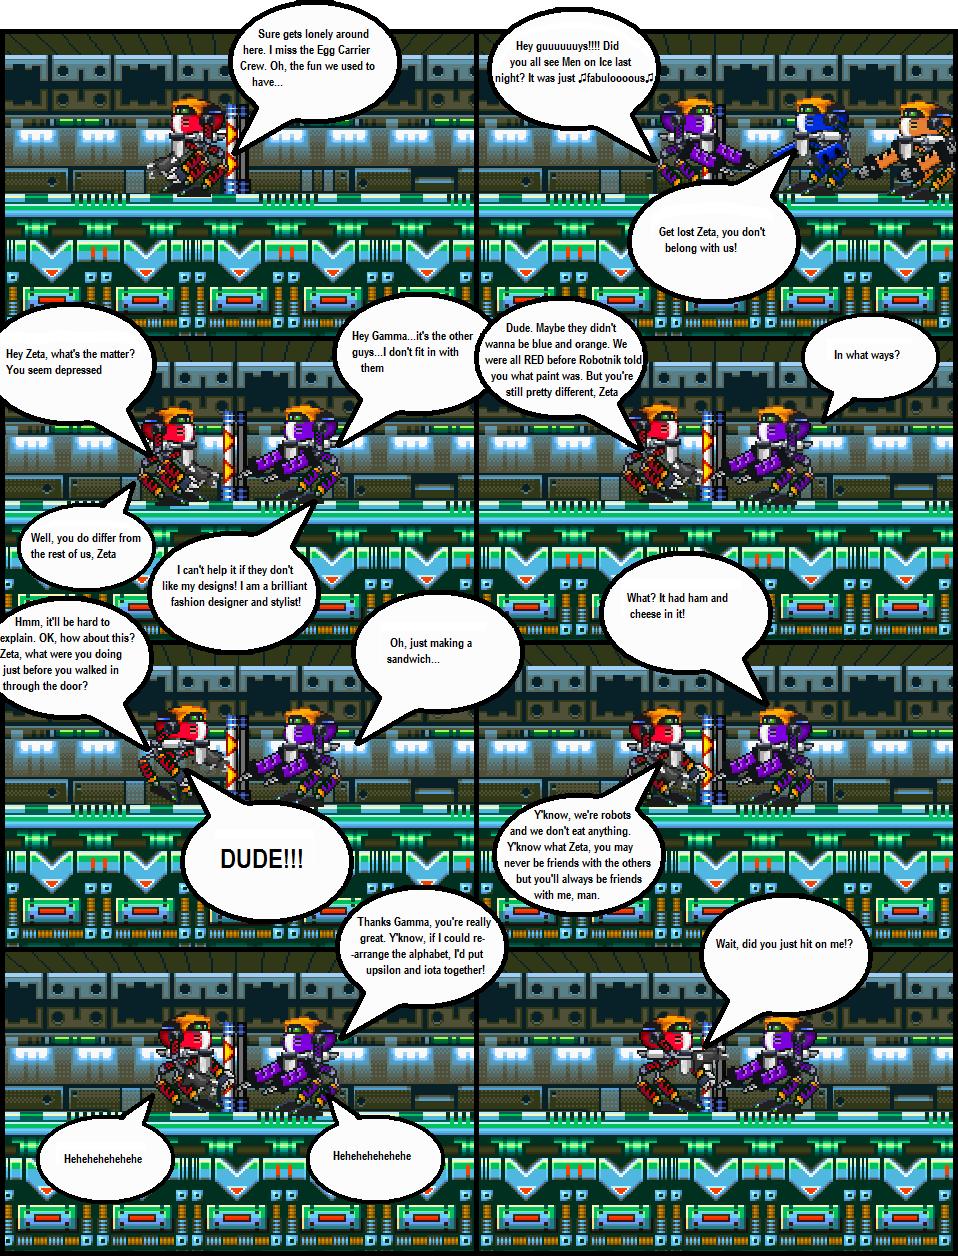 AChaoticAdventure29